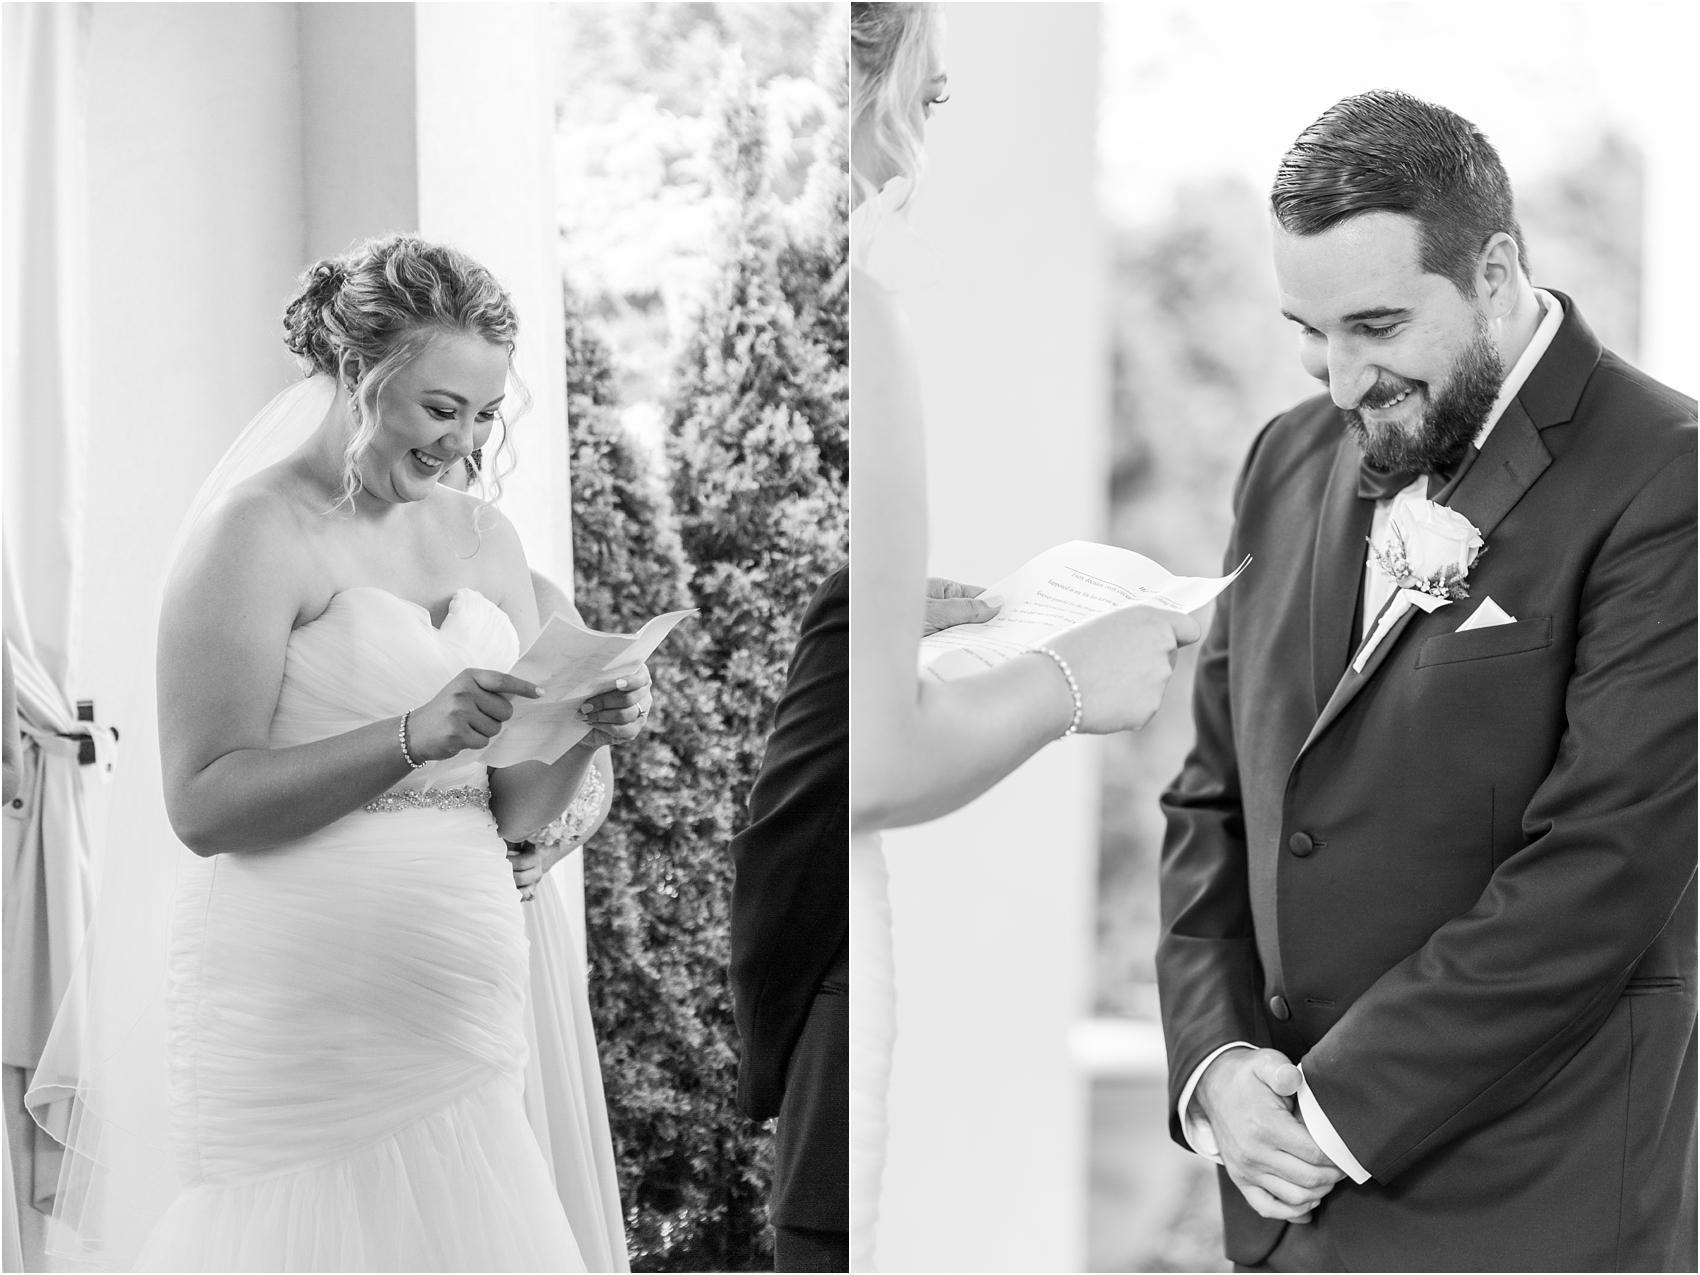 joyful-and-candid-navy-blush-wedding-photos-at-crystal-gardens-in-howell-mi-by-courtney-carolyn-photography_0042.jpg